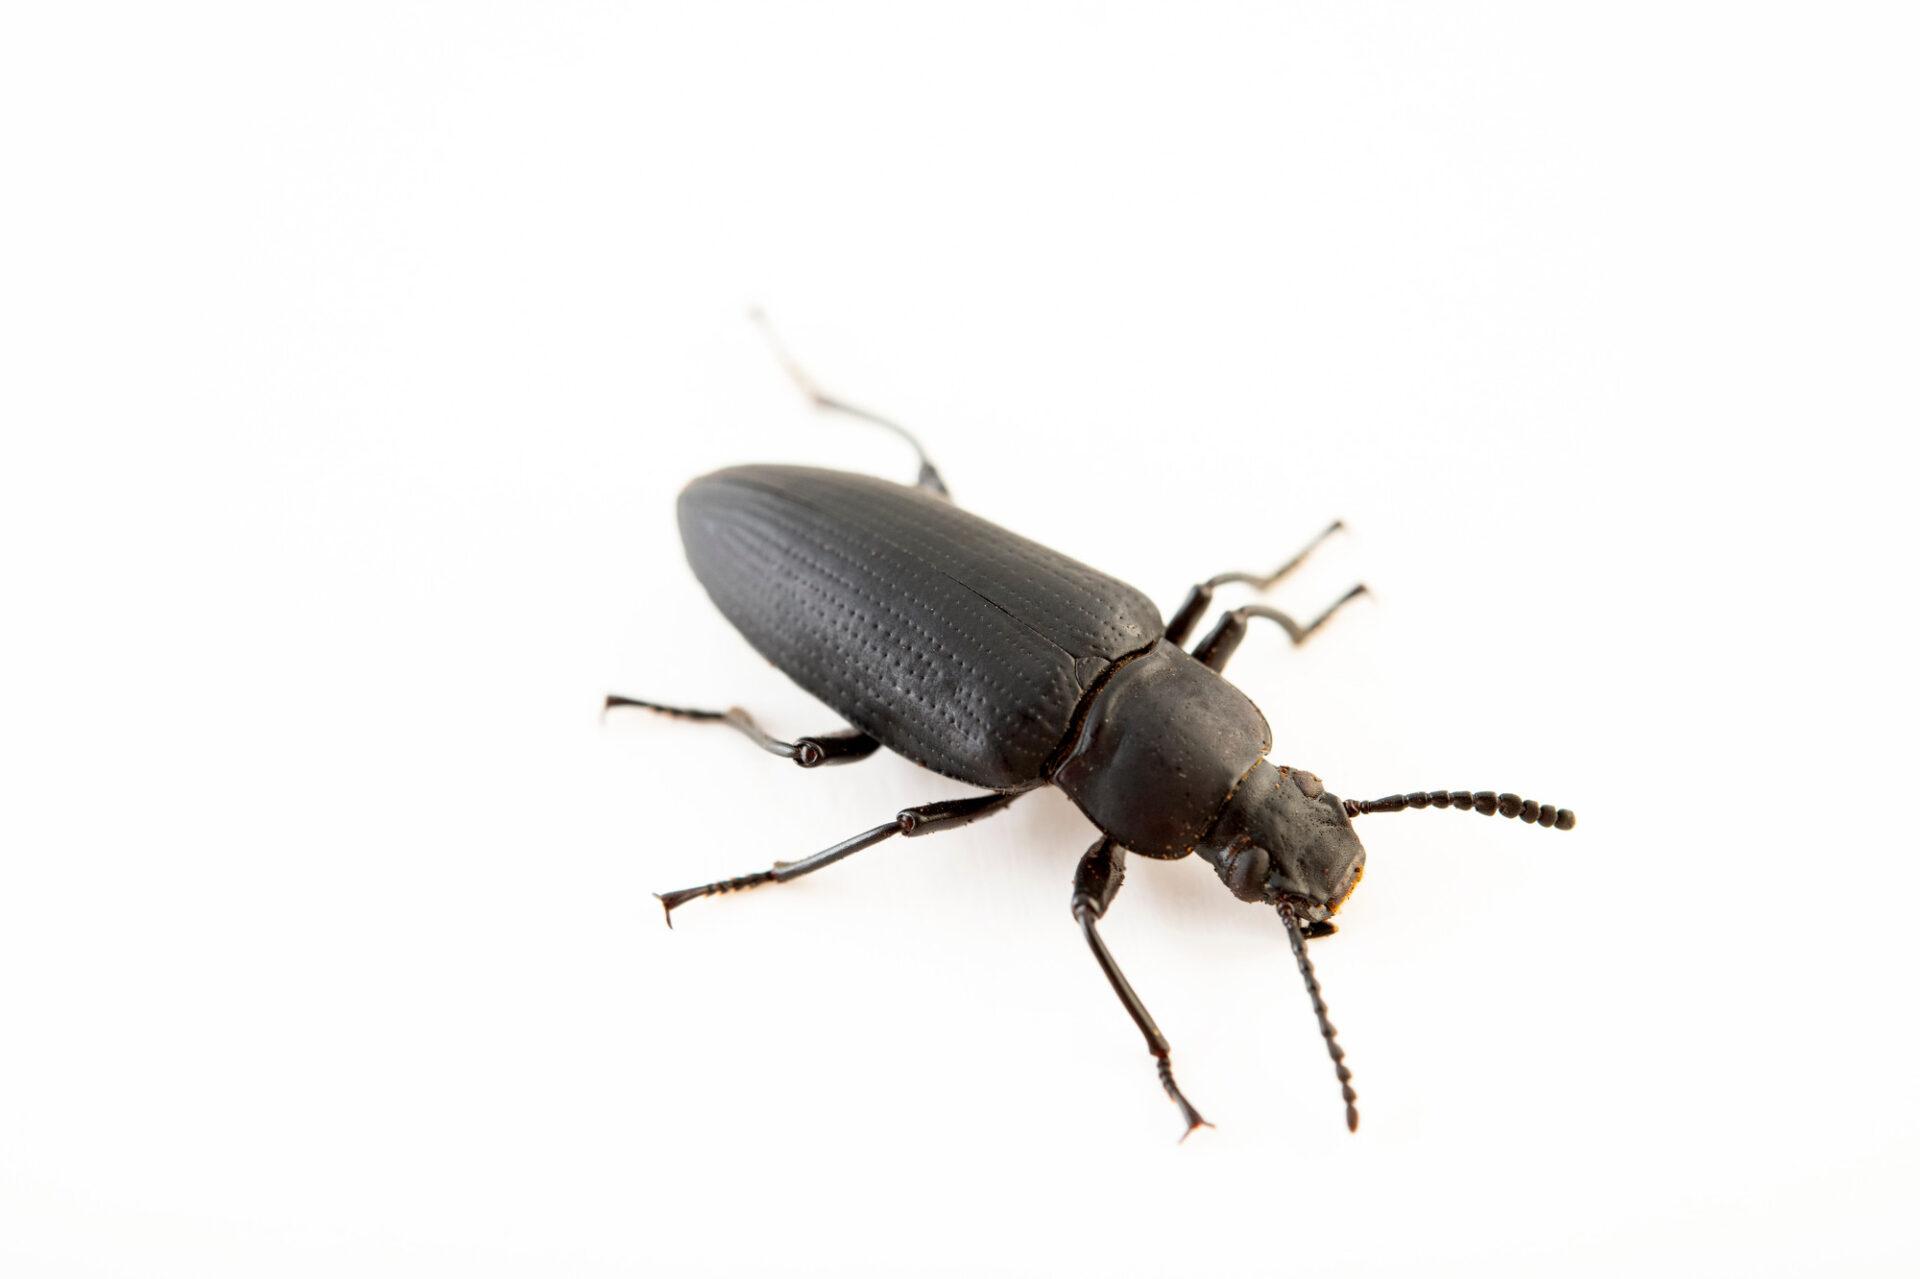 Photo: A giant mealworm beetle (Zophobas atratus) at Safari Park Dvur Kralove.